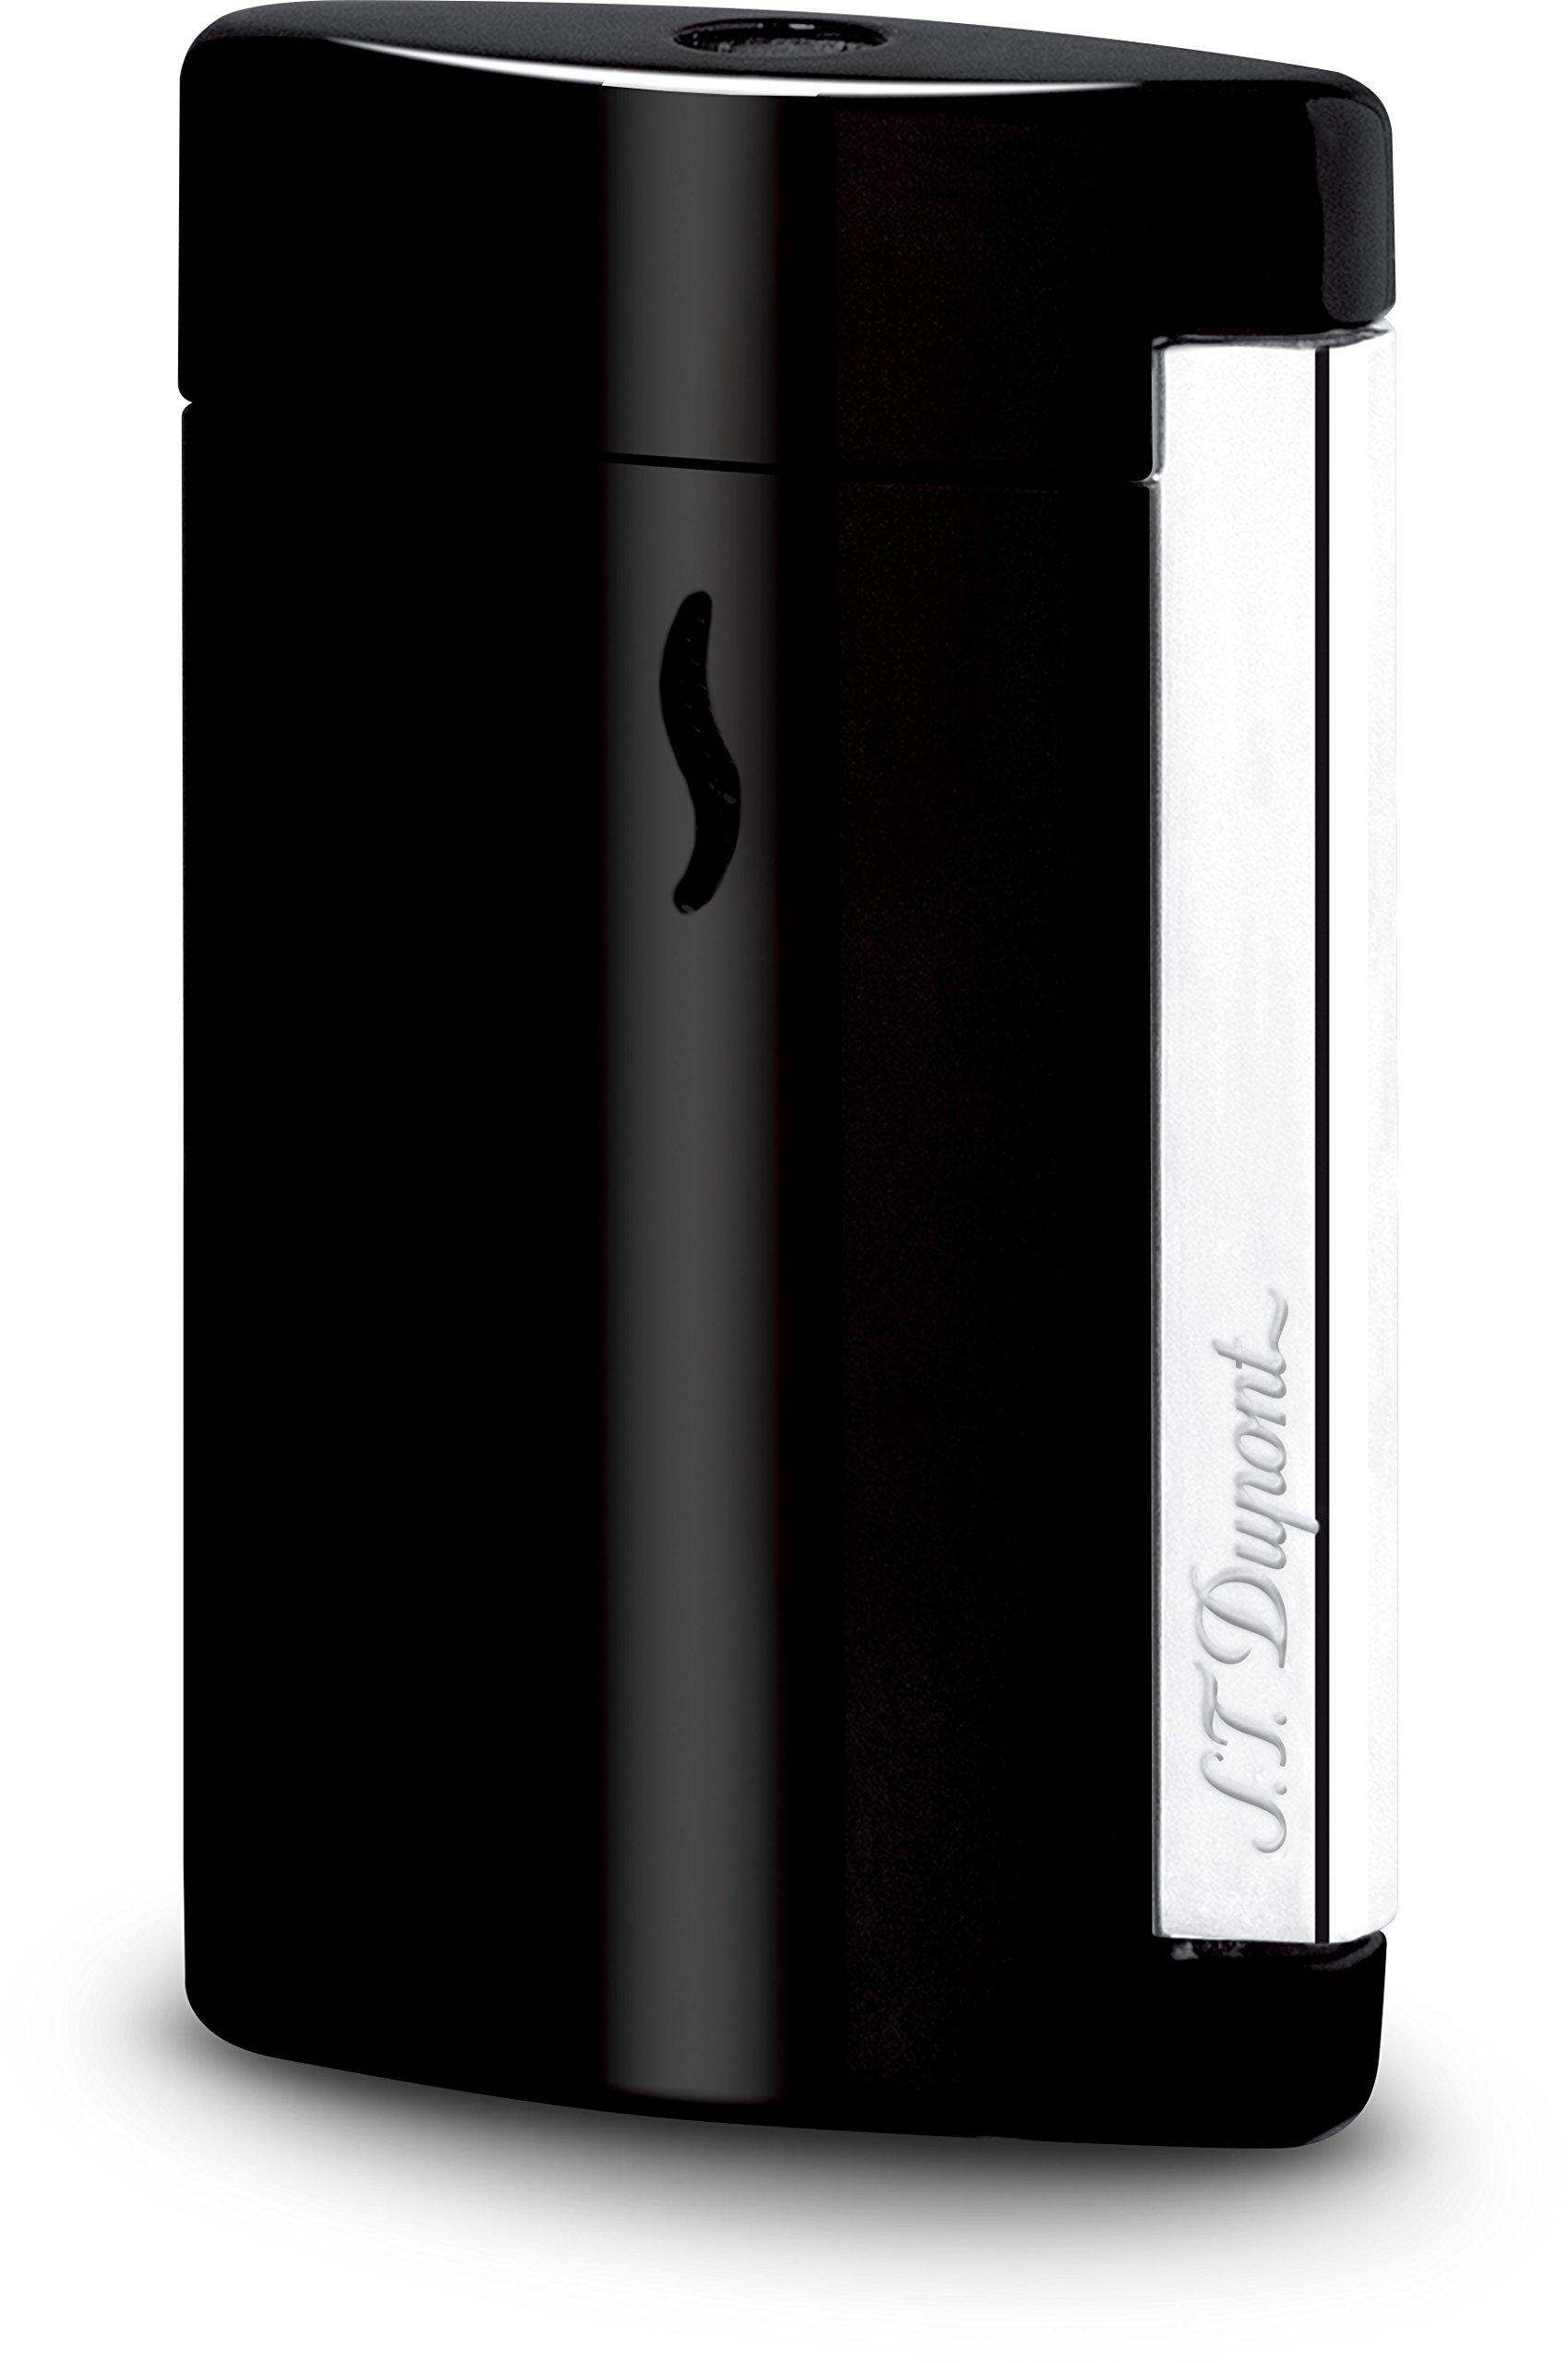 S.T. Dupont Minijet 2 Shiny Black Torch Flame Jet Lighter / 010501